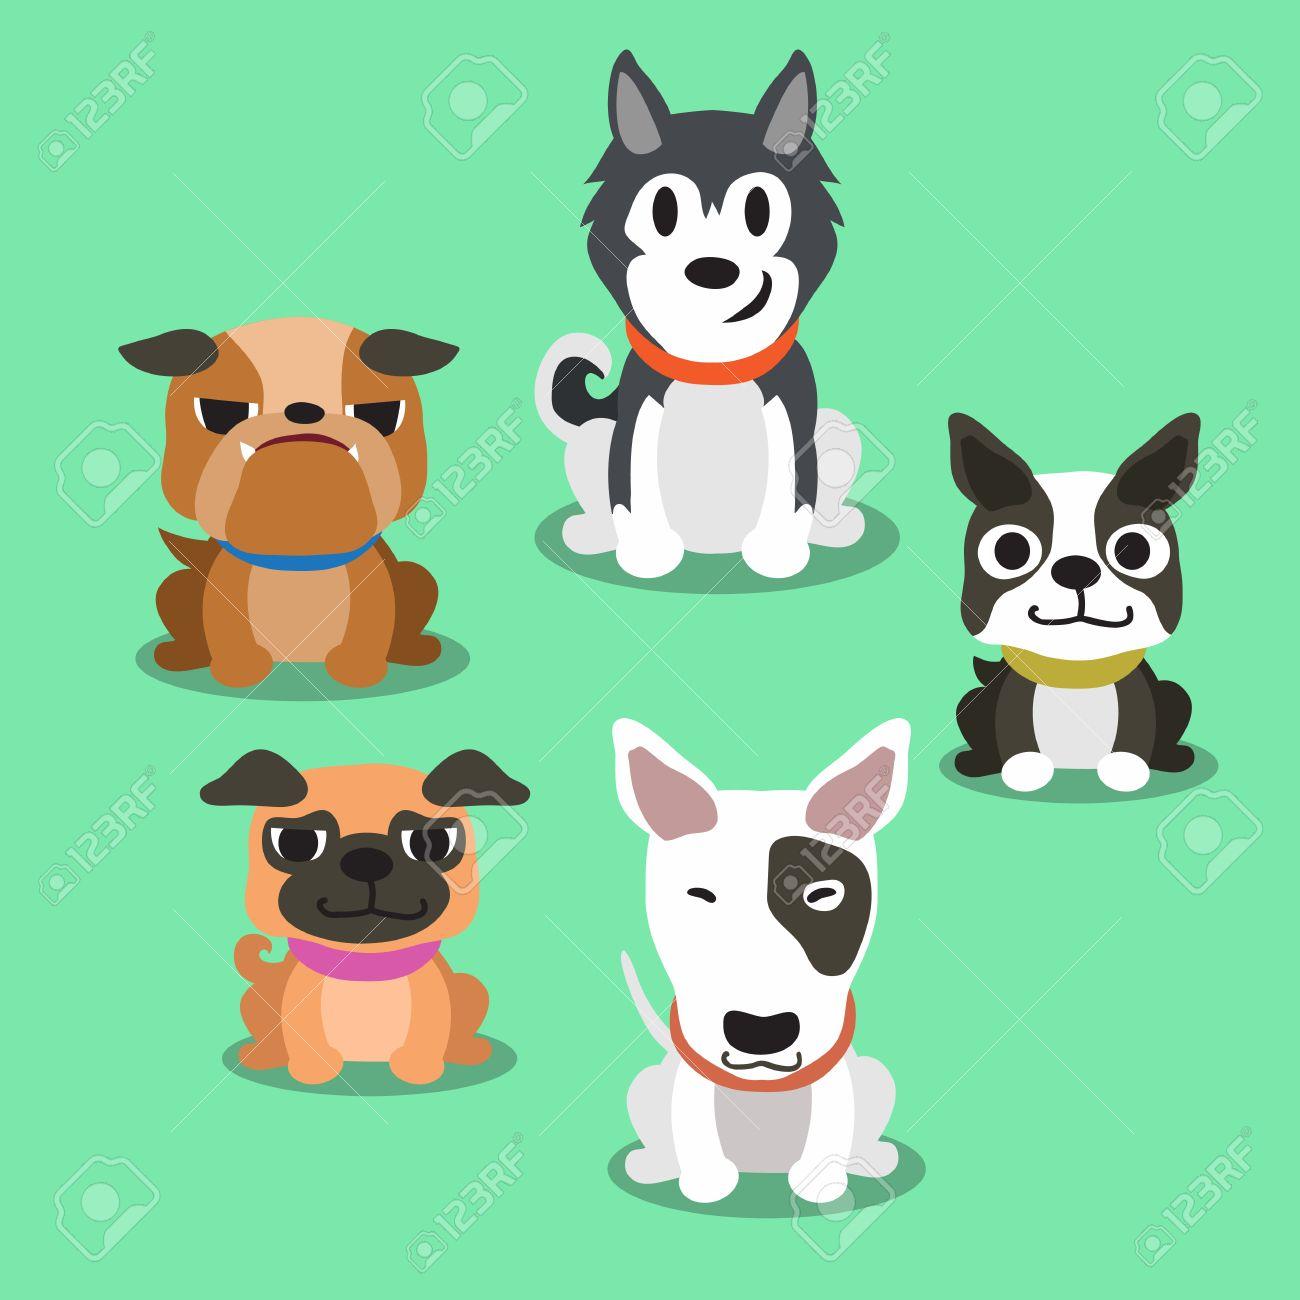 Cartoon dogs standing - 47263245